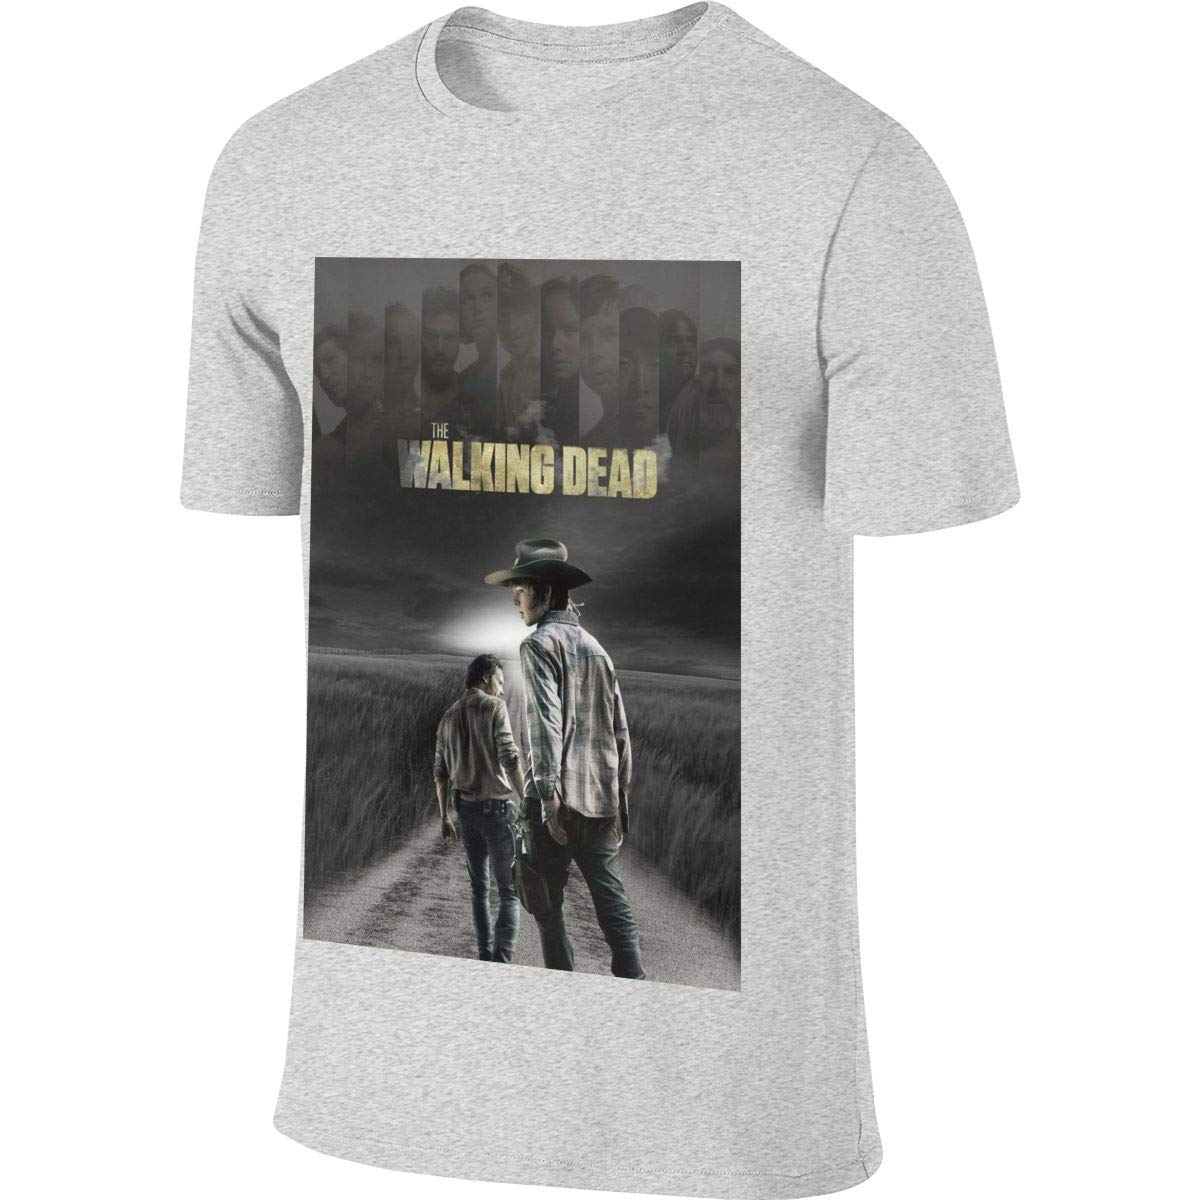 NICOTE Mens Customized Humor Top The Walking Dead Tshirt